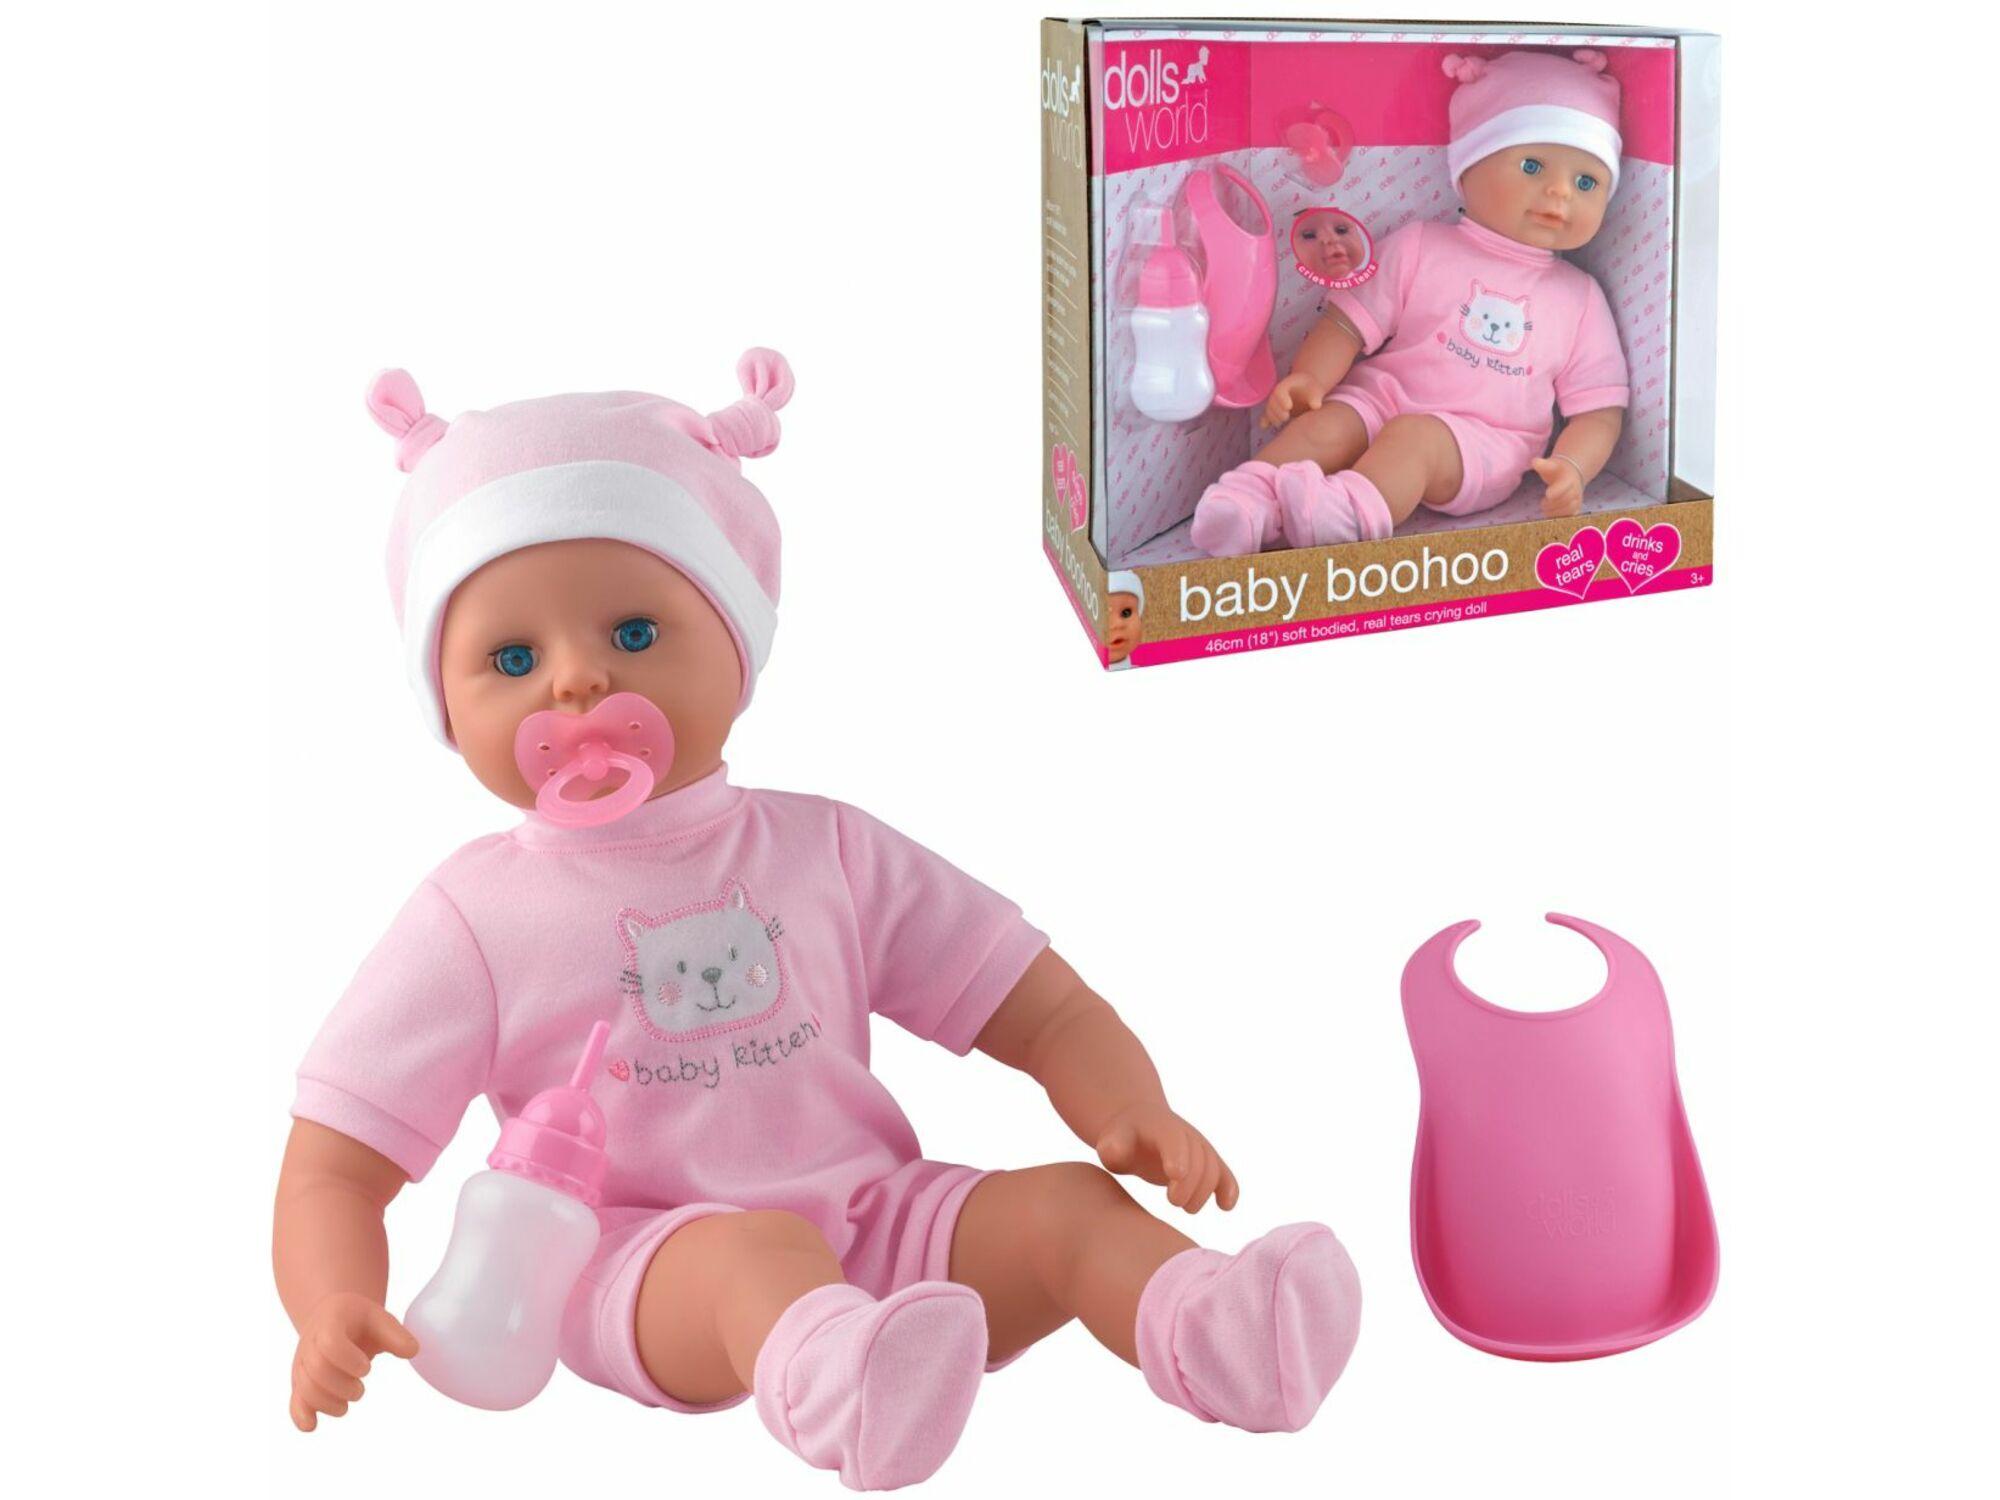 Baby boohoo 46cm 54-818000